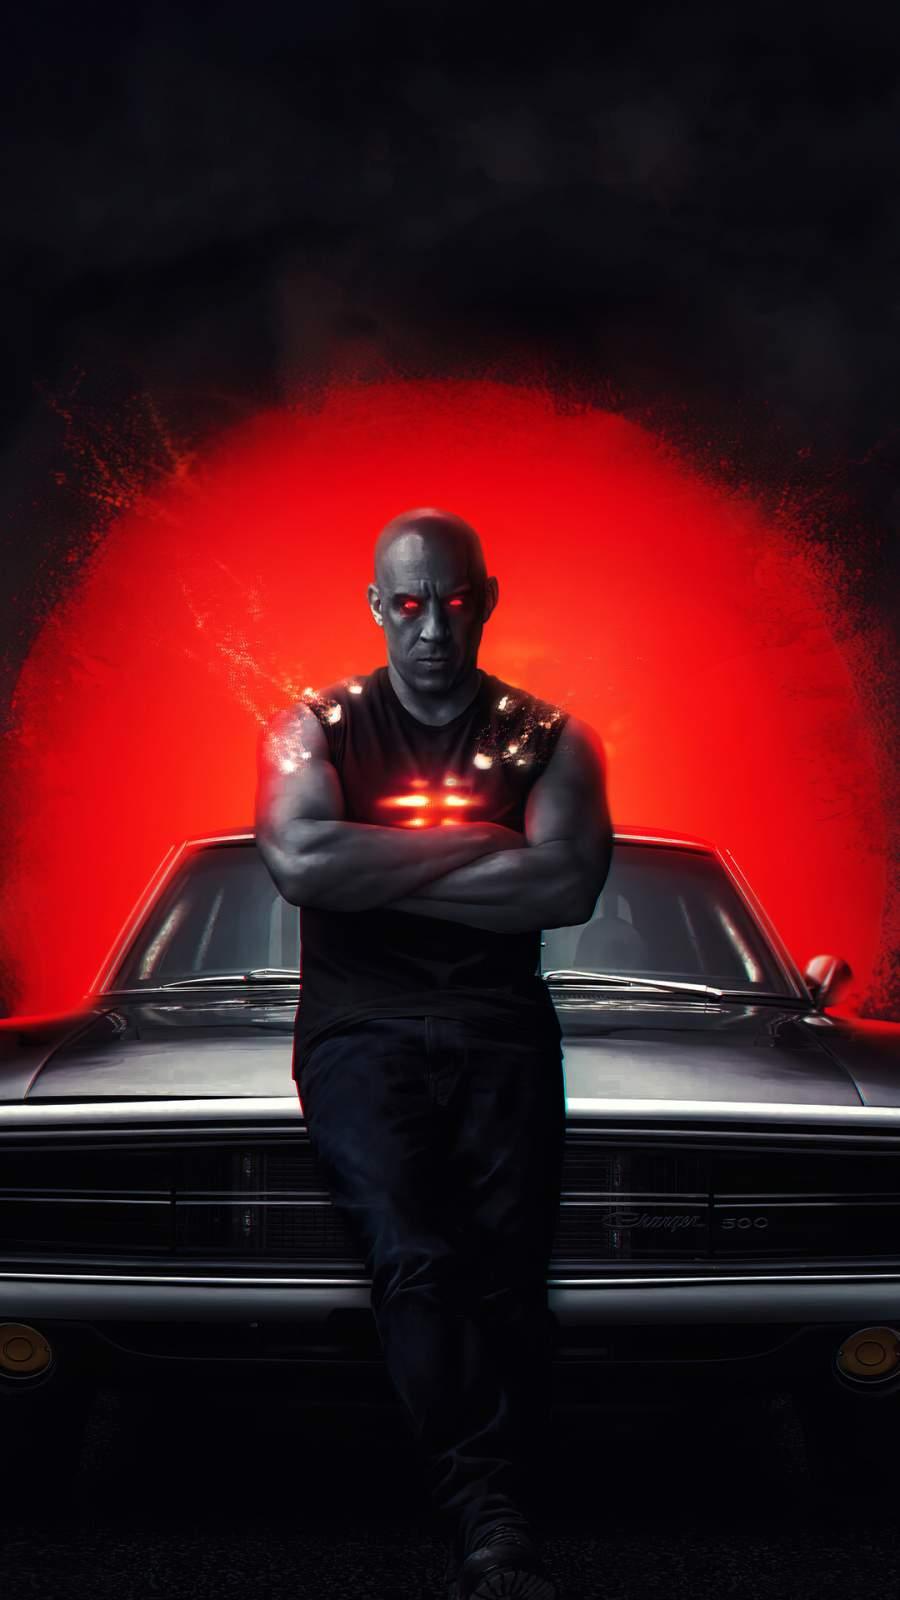 Bloodshot Vin Diesel iPhone Wallpaper